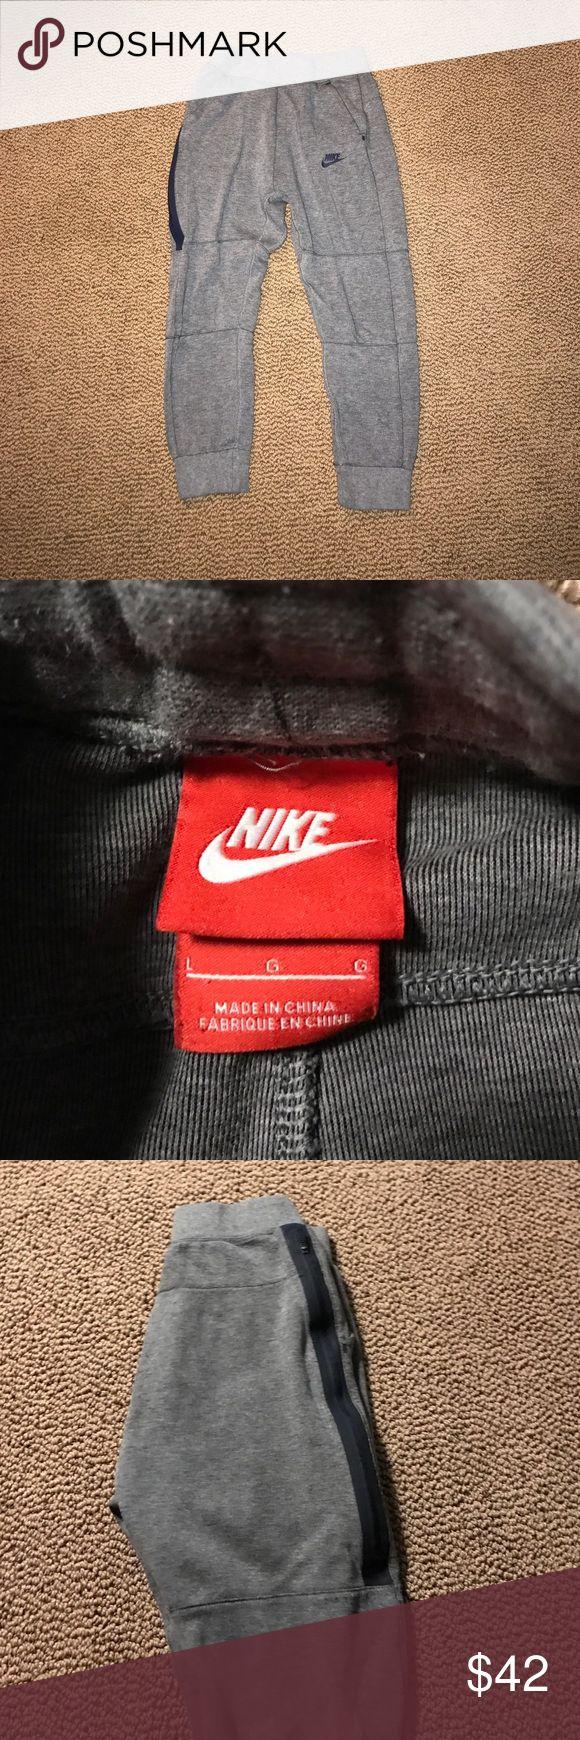 Nike tech fleece joggers- Boys large Boys large joggers, only worn twice Nike Bottoms Sweatpants & Joggers